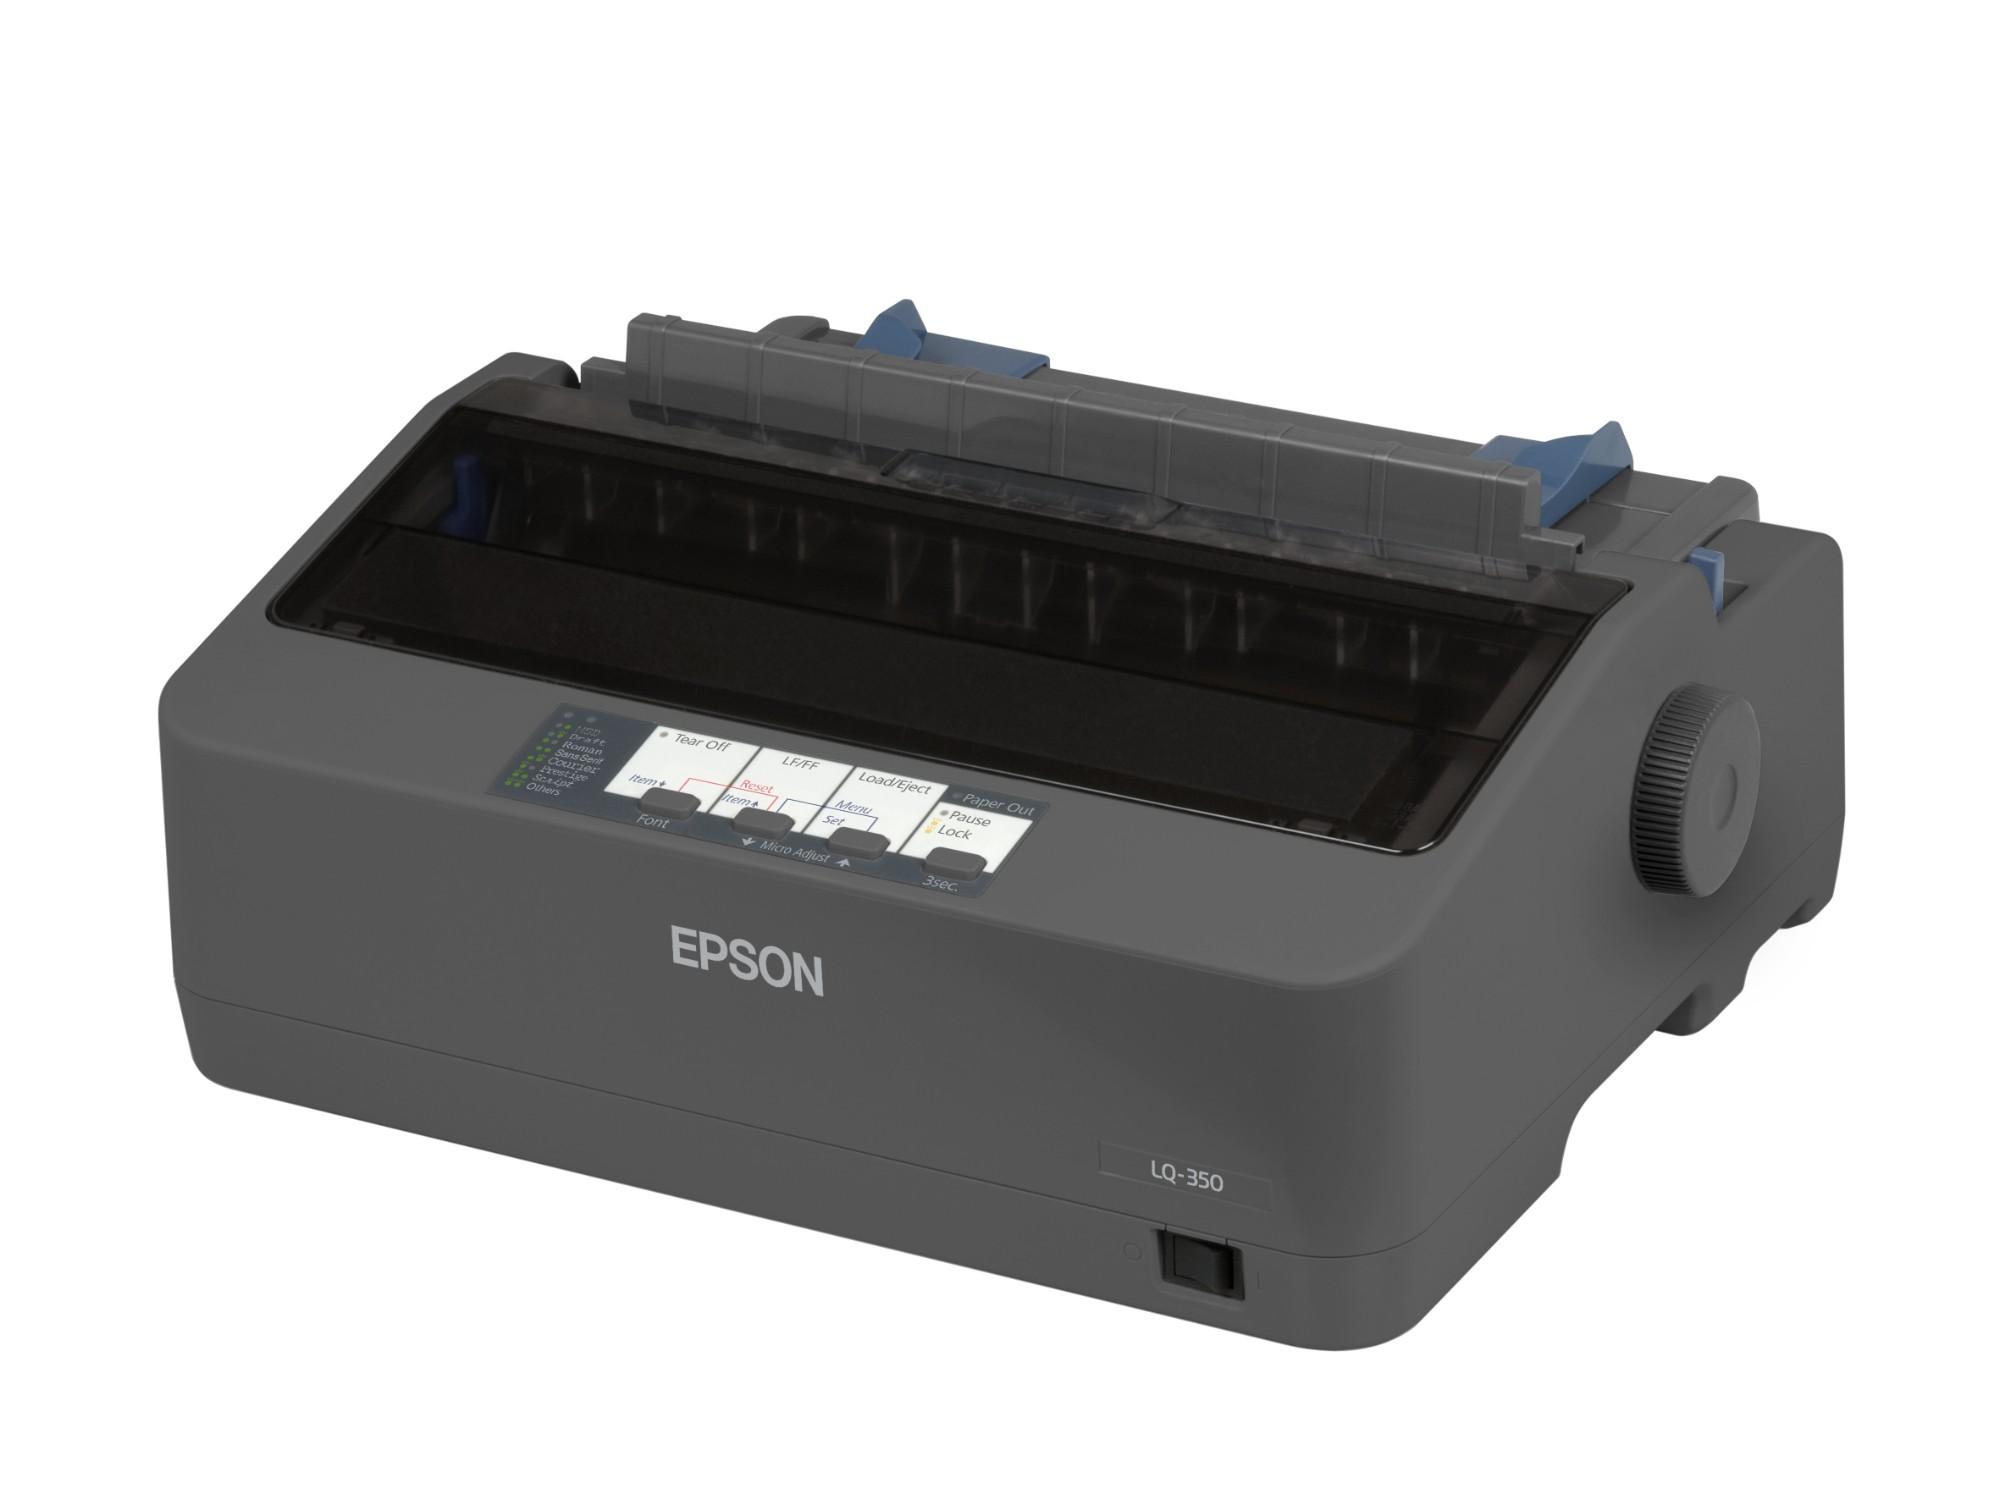 epson lq350 dot matrix printer 93 in distributor